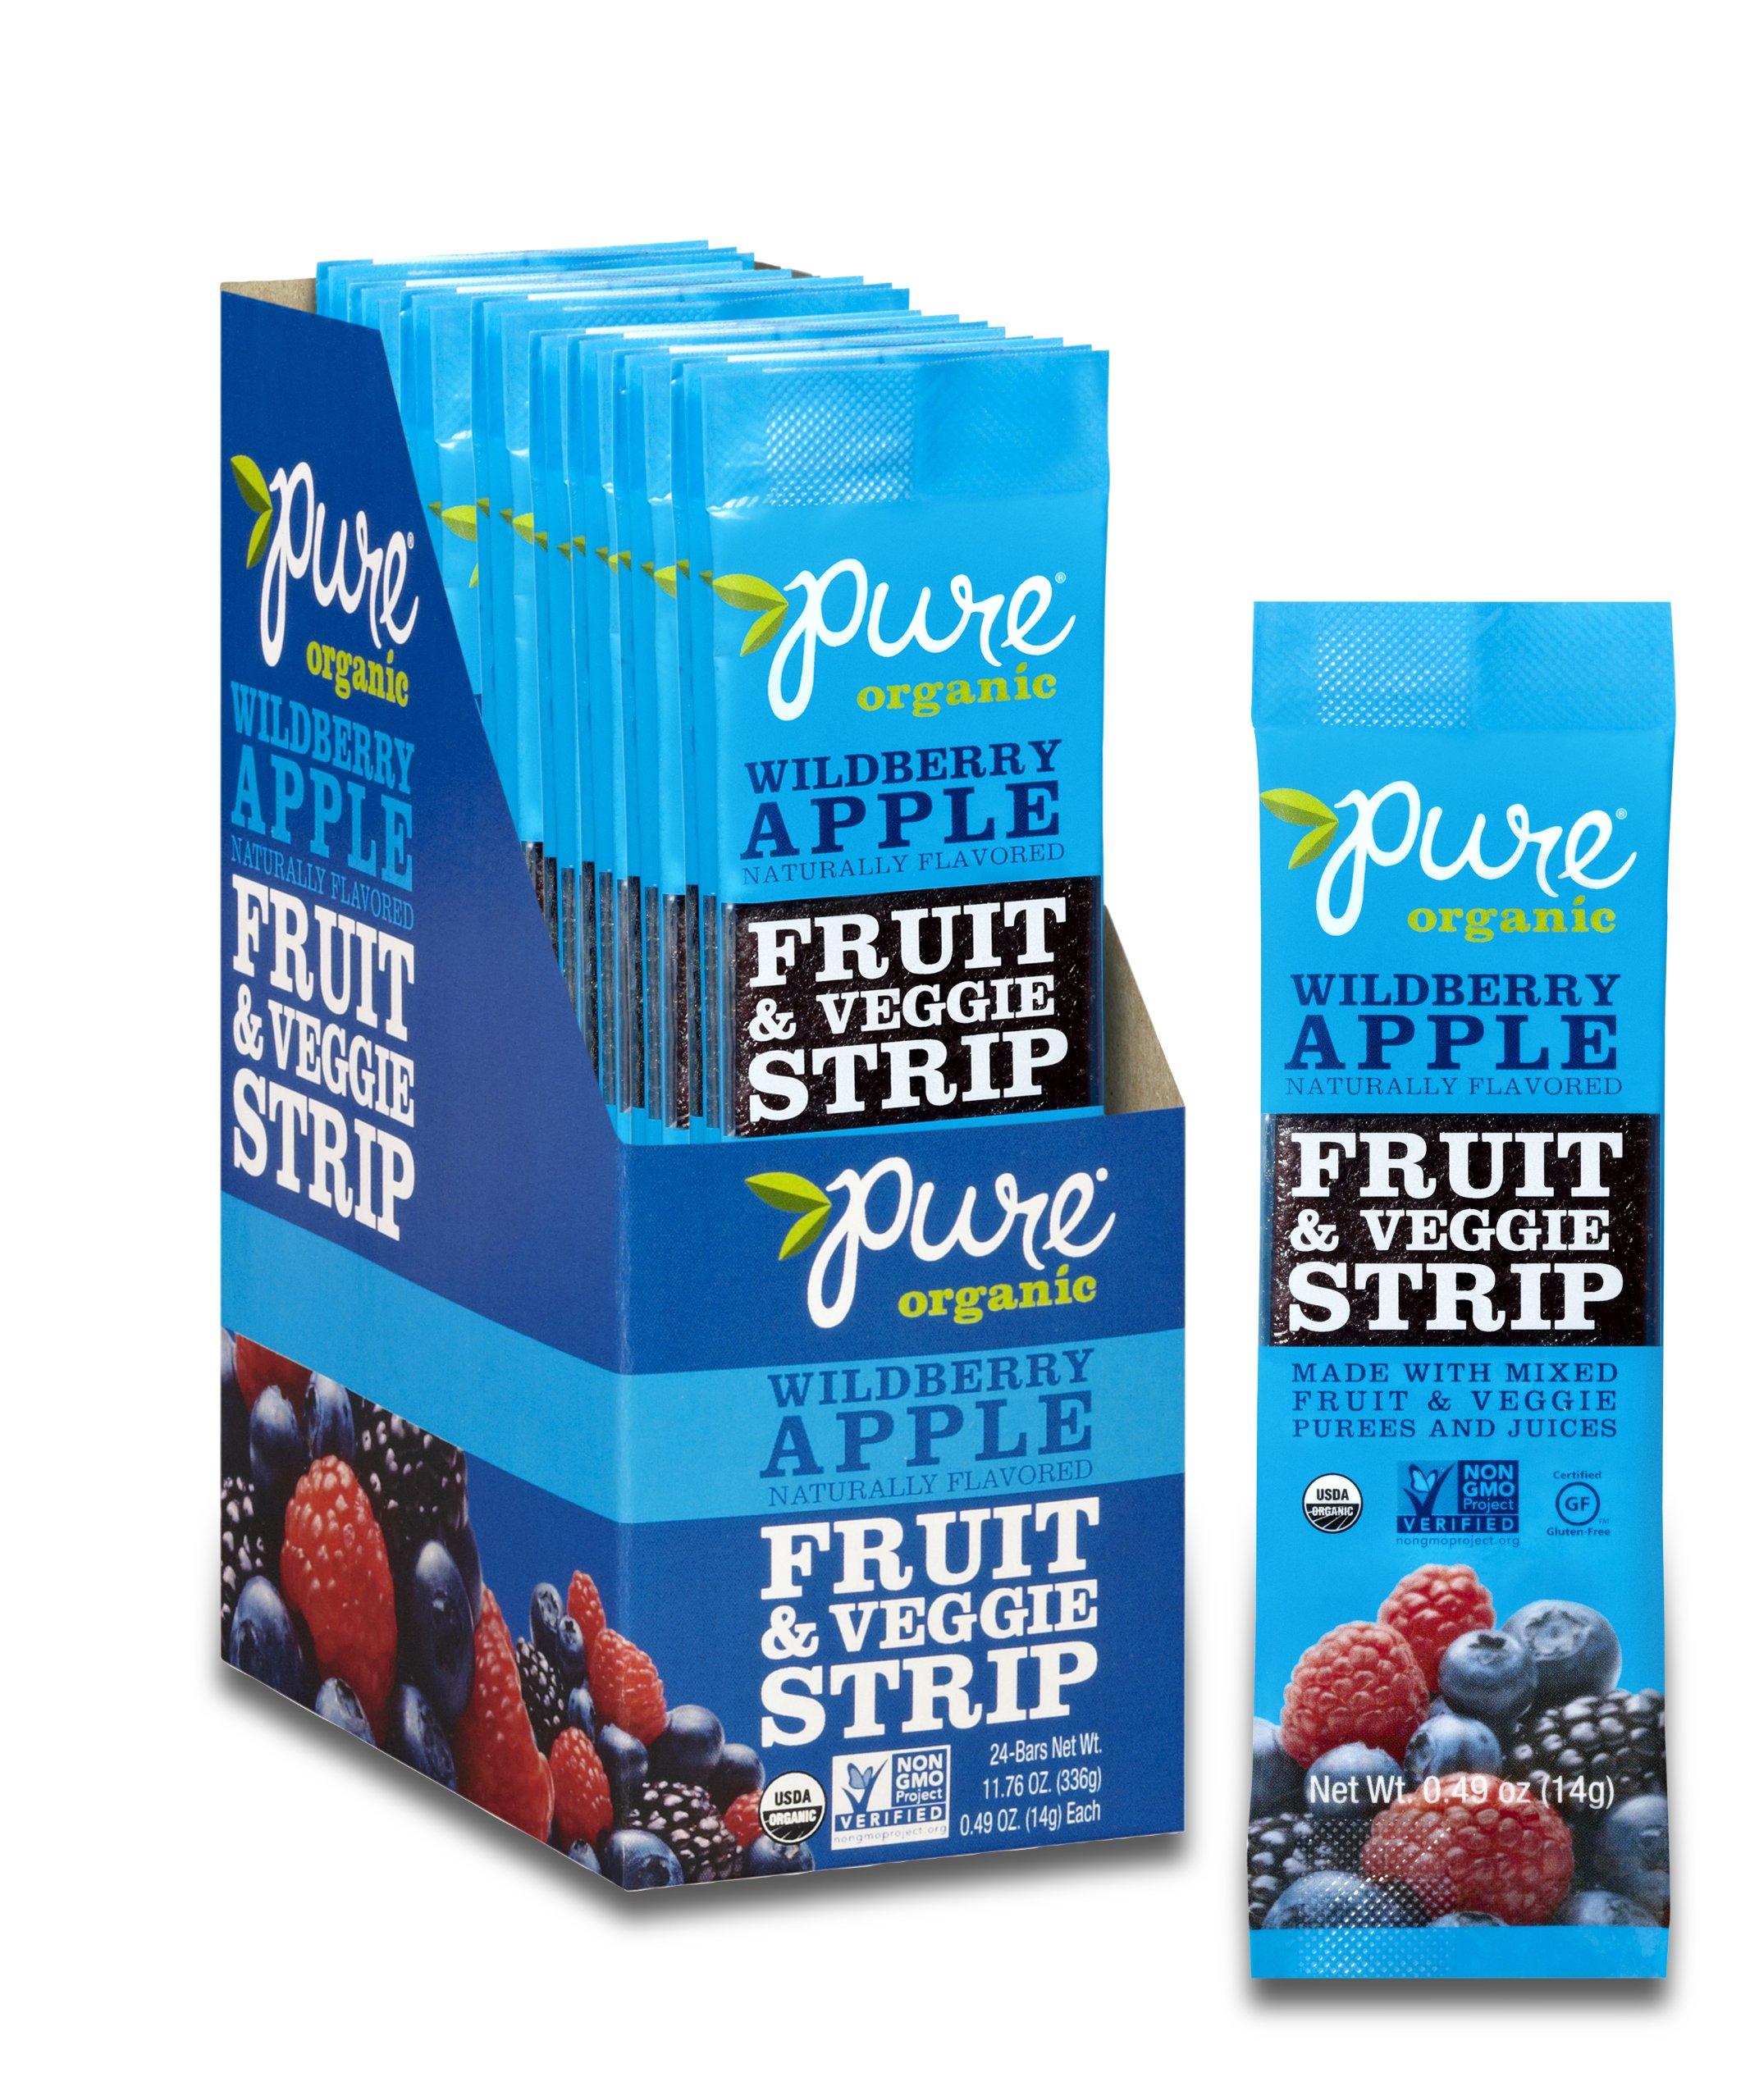 Pure Organic Wildberry Apple Fruit & Veggie Strip, Certified Organic, Gluten-Free, Non-GMO, Vegan, Kosher, Peanut Free, No Artificial Ingredeints, Fruit Snack, 0.49 ounce (Pack of 24)